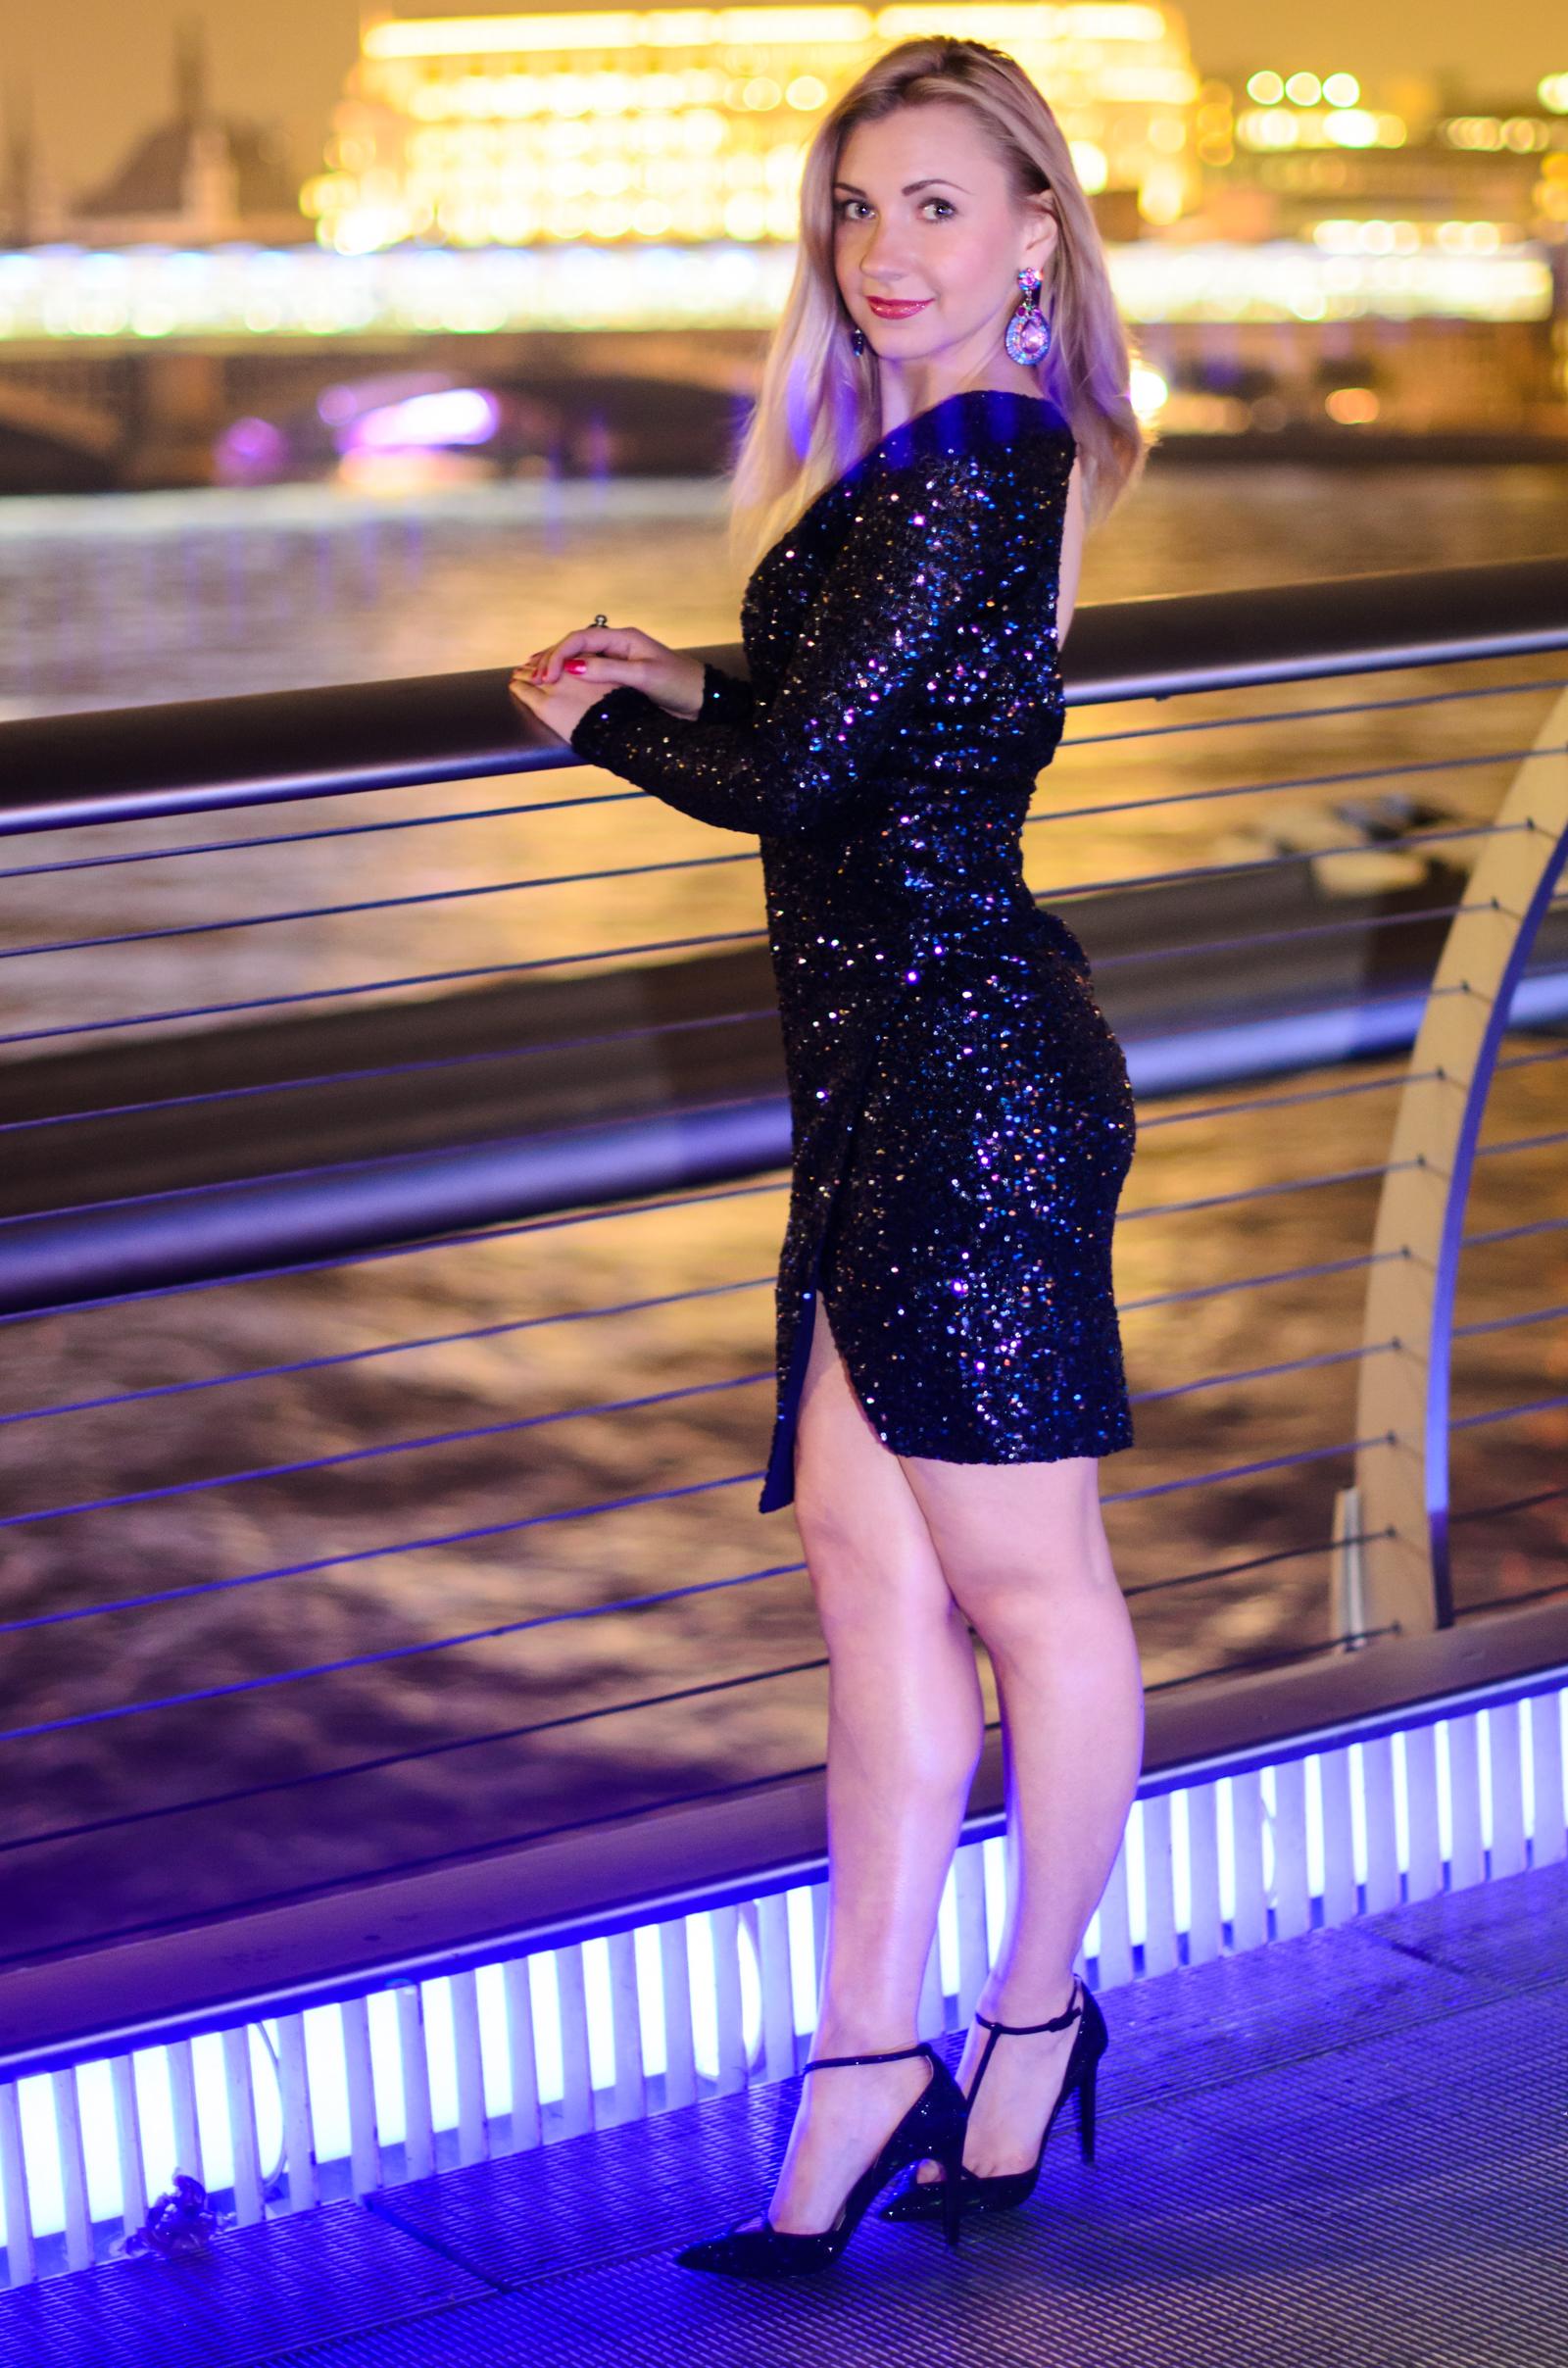 Midnight Blue Sequin Dress Amp Crystal Heels Fashion Blues